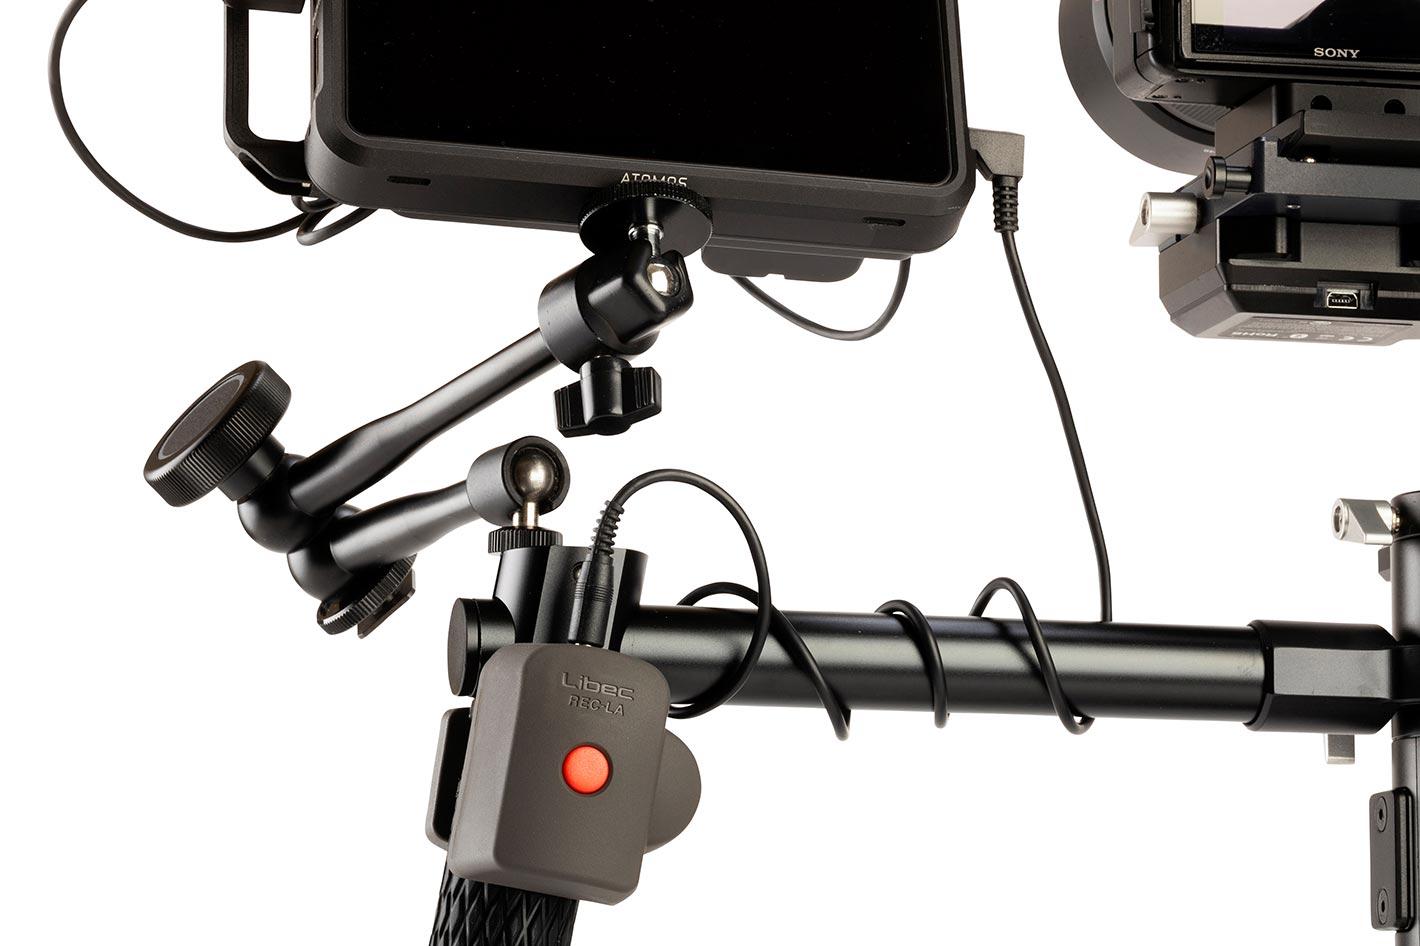 Libec announces the world's lightest video tripods